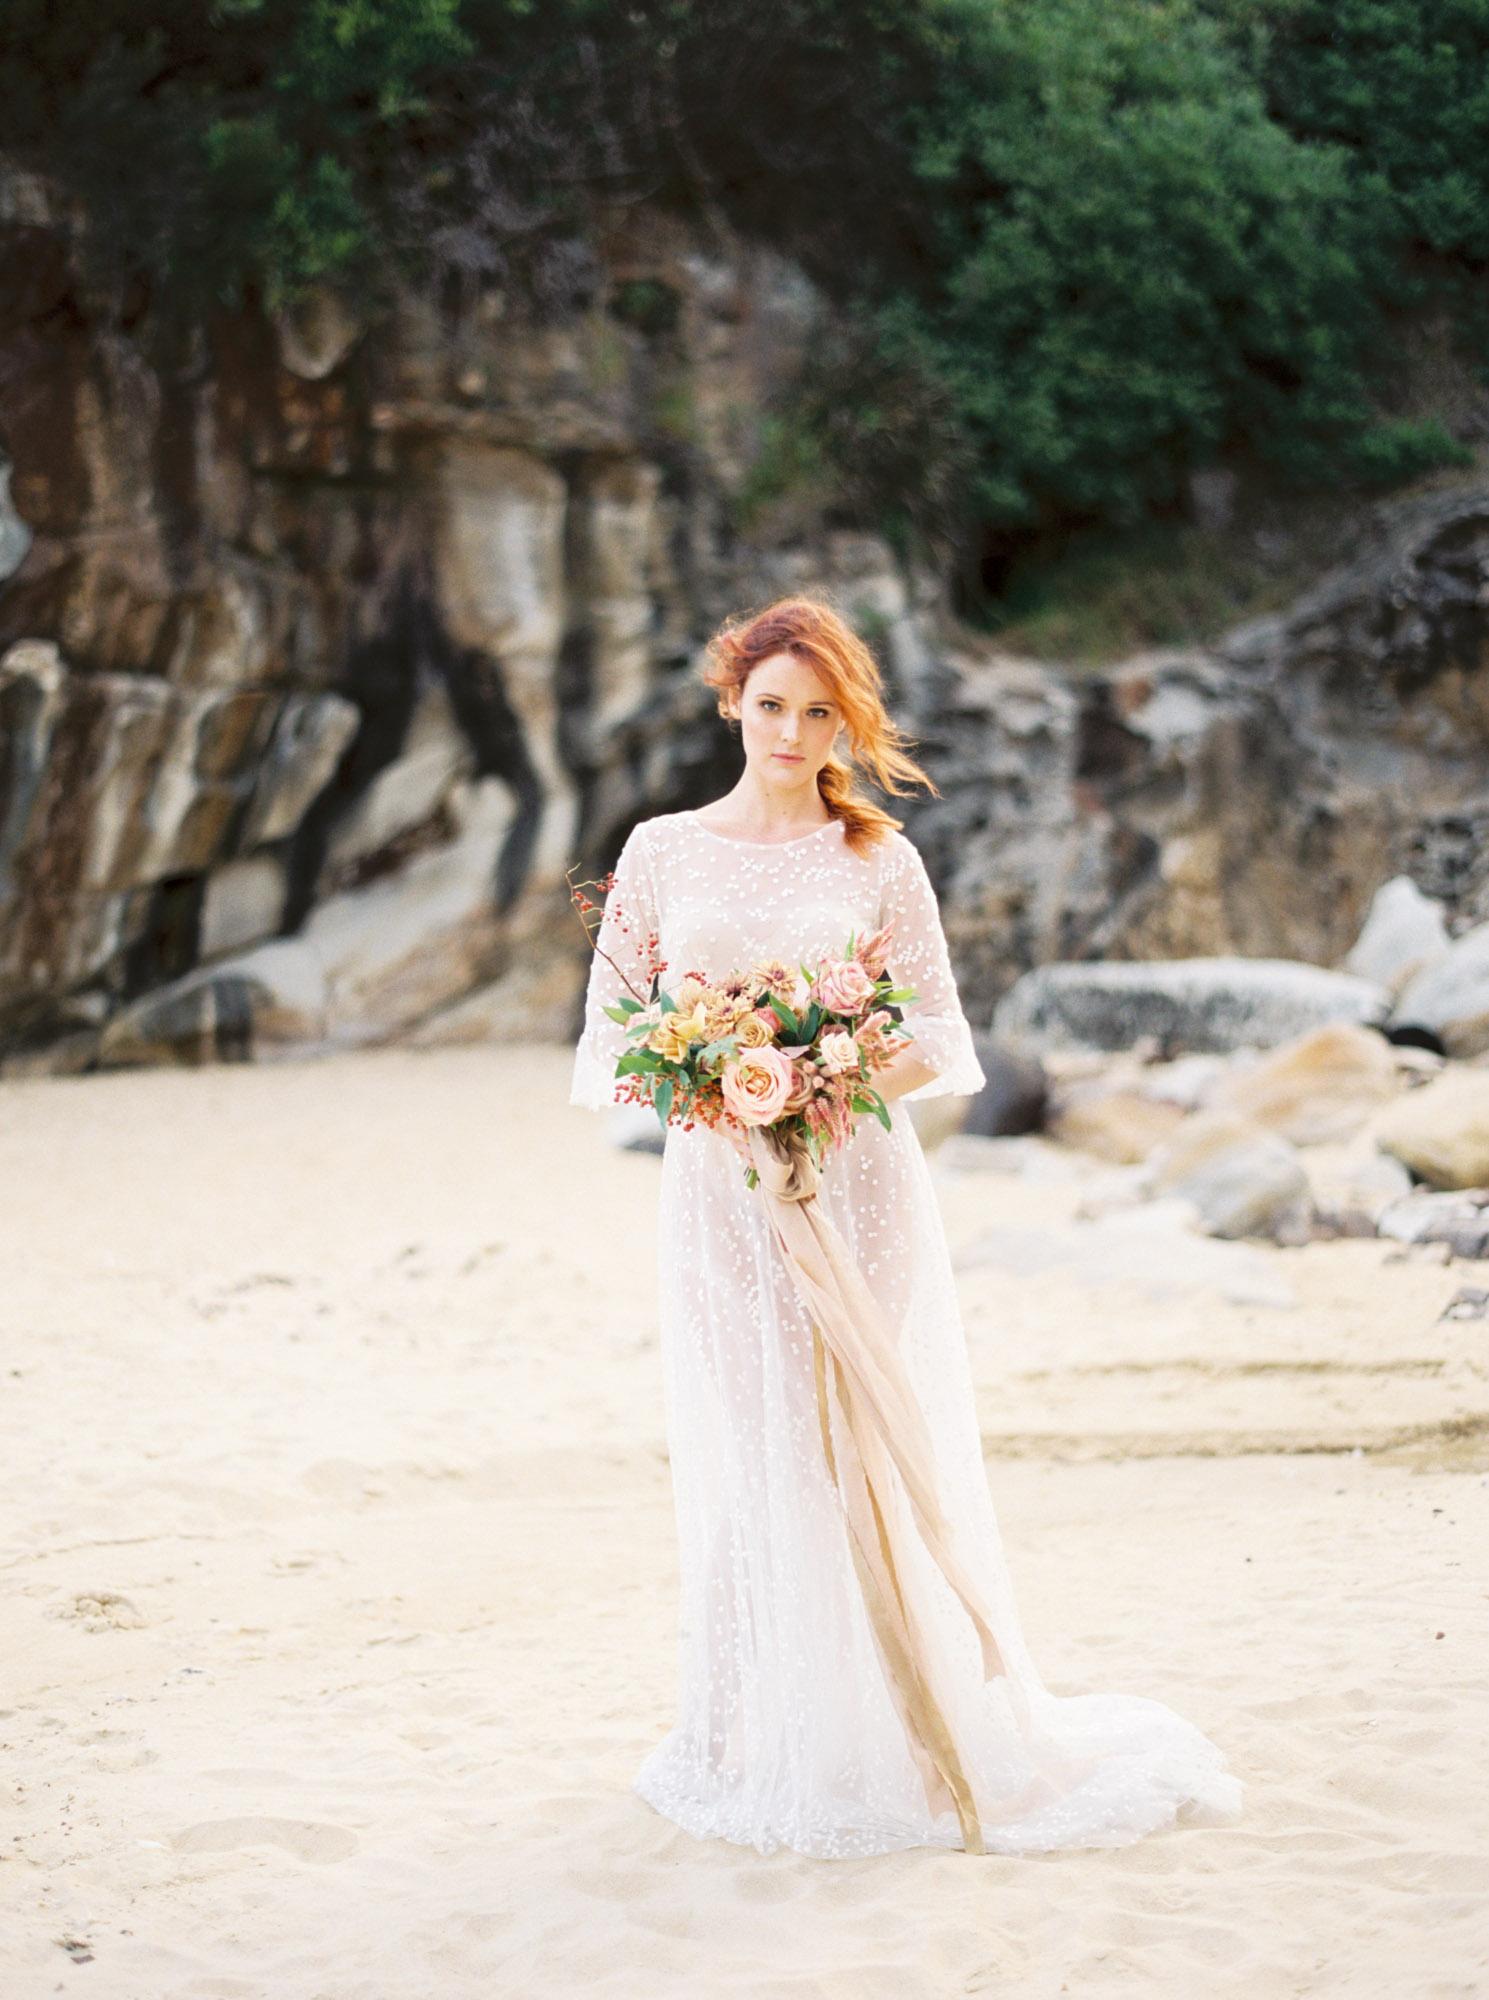 00027- Fine Art Film Newcastle NSW Wedding Photographer Sheri McMahon.jpg